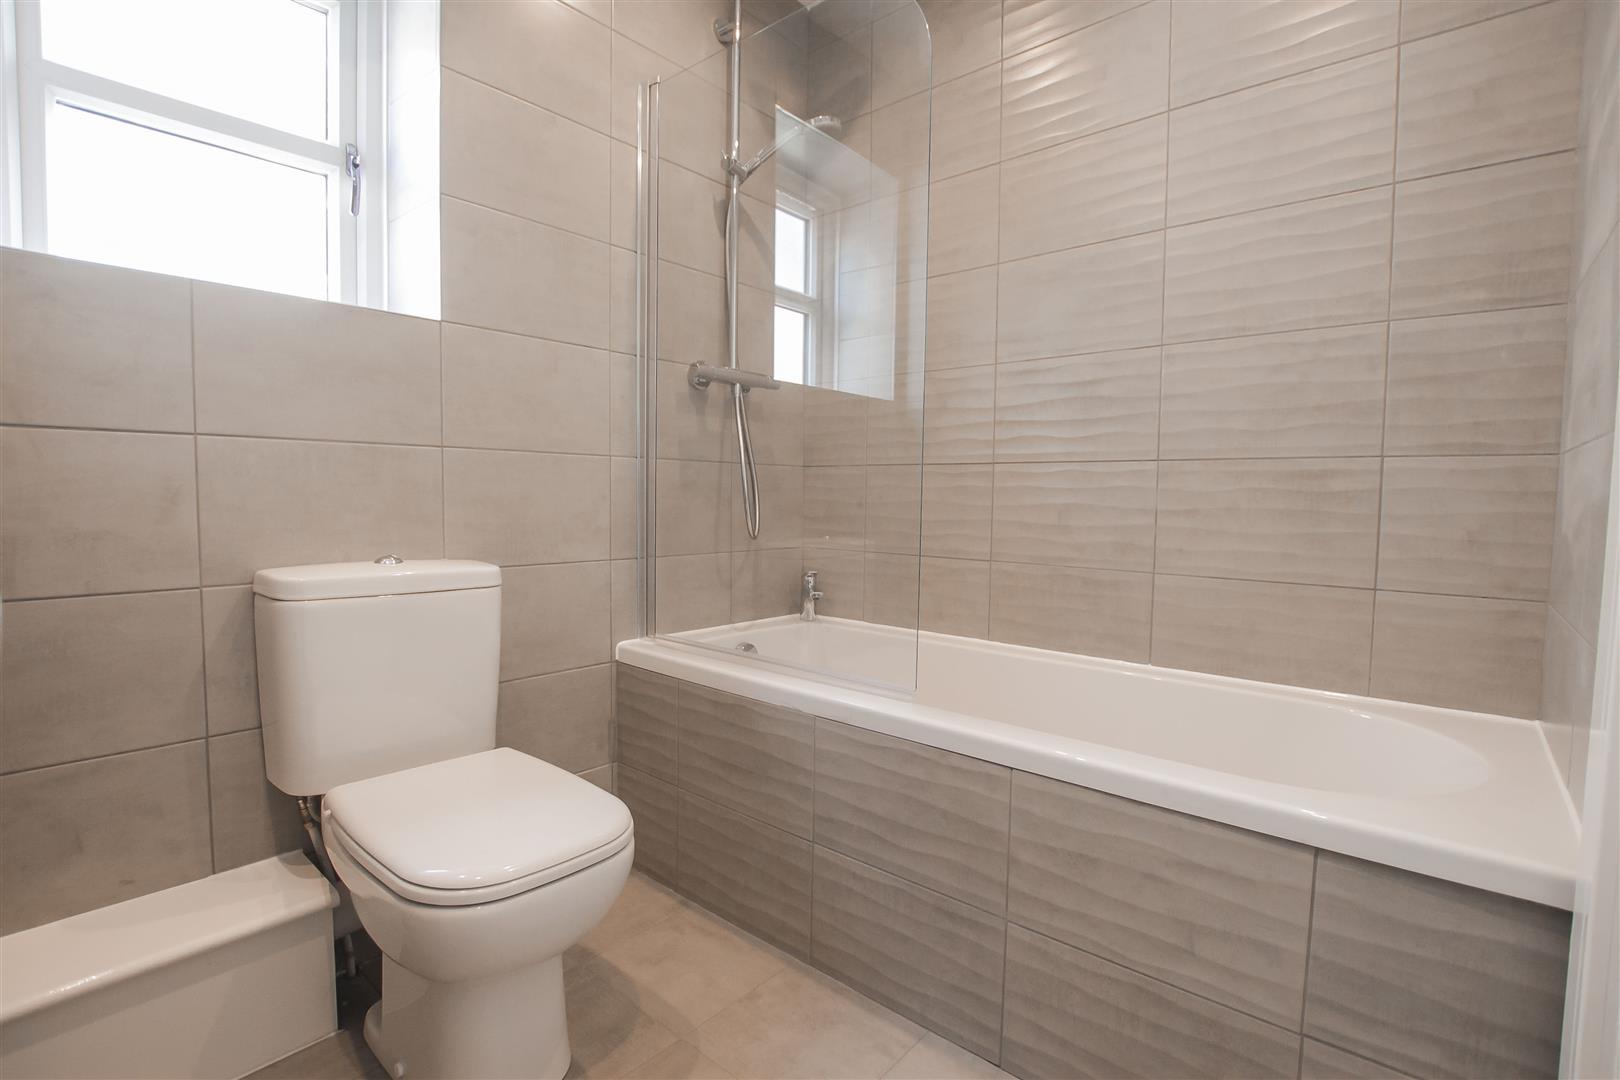 4 Bedroom Detached House For Sale - Show Home Bathroom (1).jpg